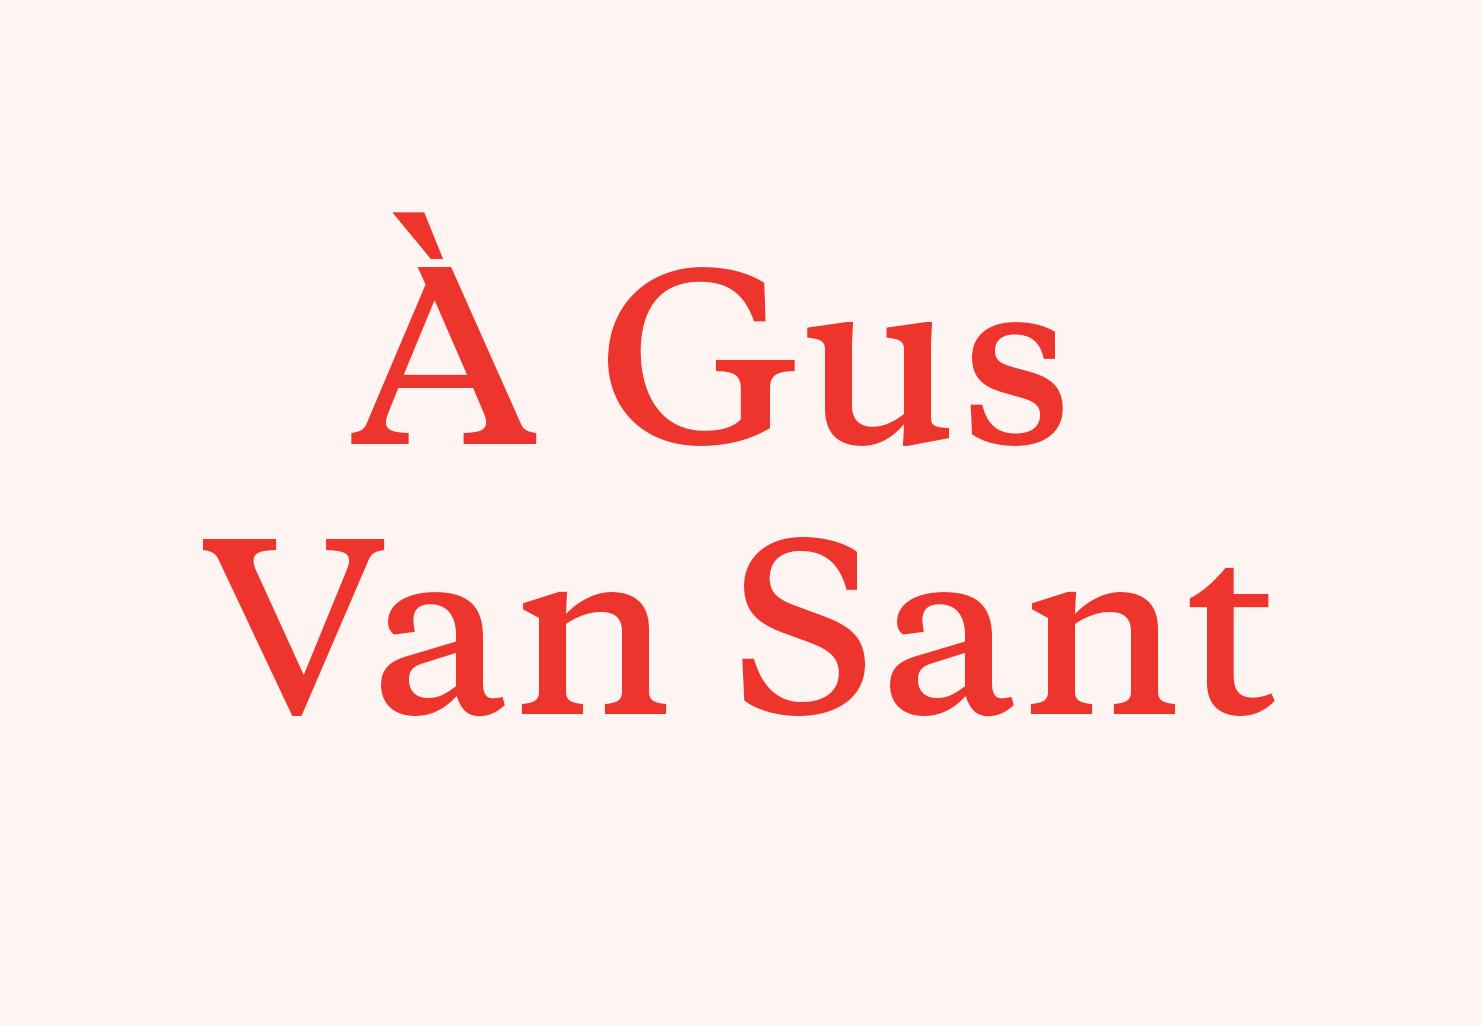 À Gus Van Sant